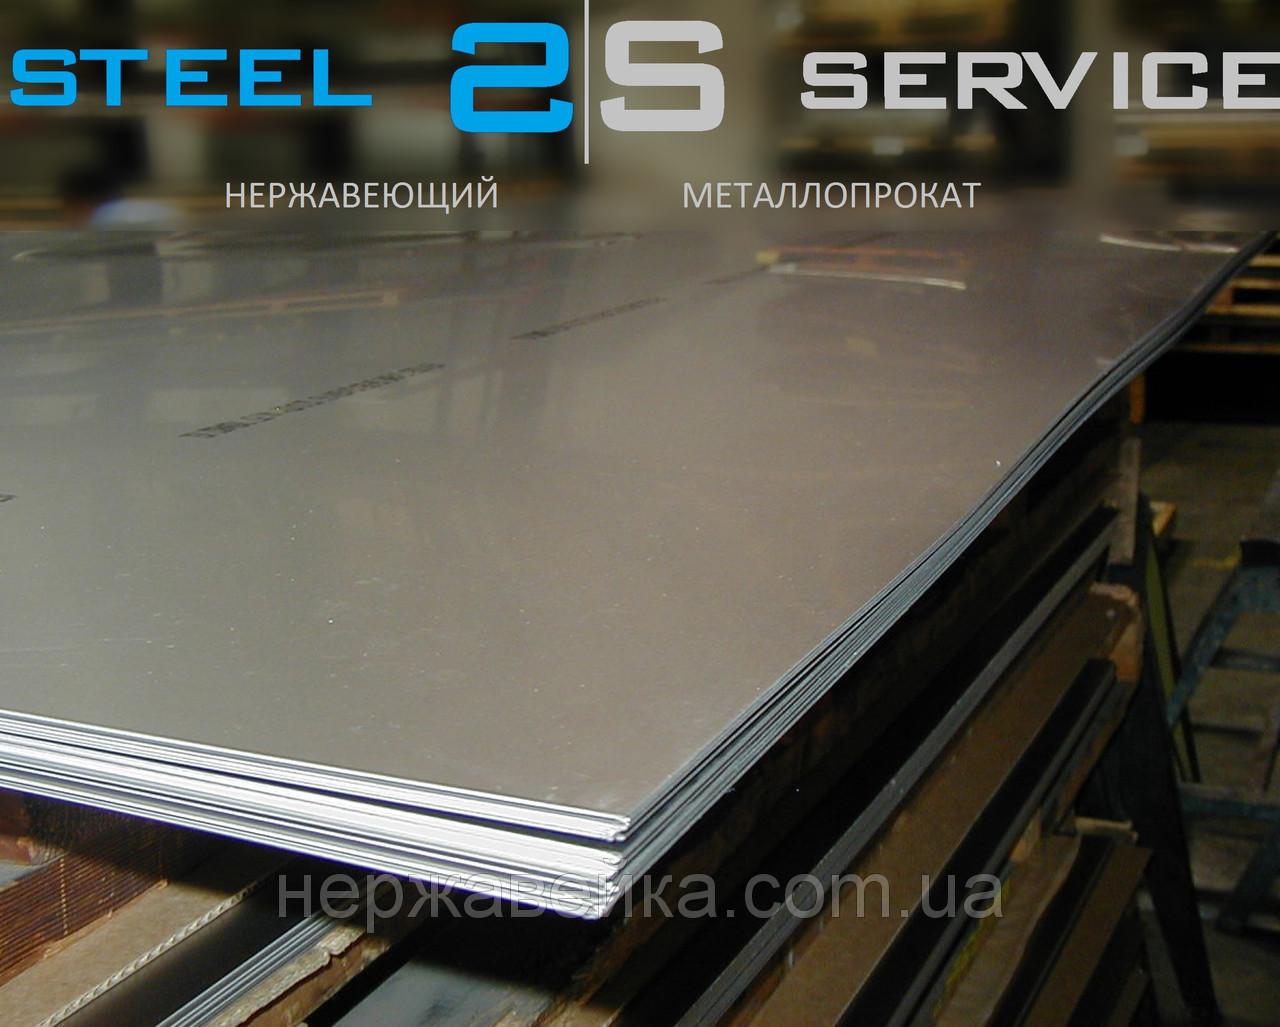 Листовая нержавейка 2х1250х2500мм AISI 430(12Х17) 2B - матовый, технический